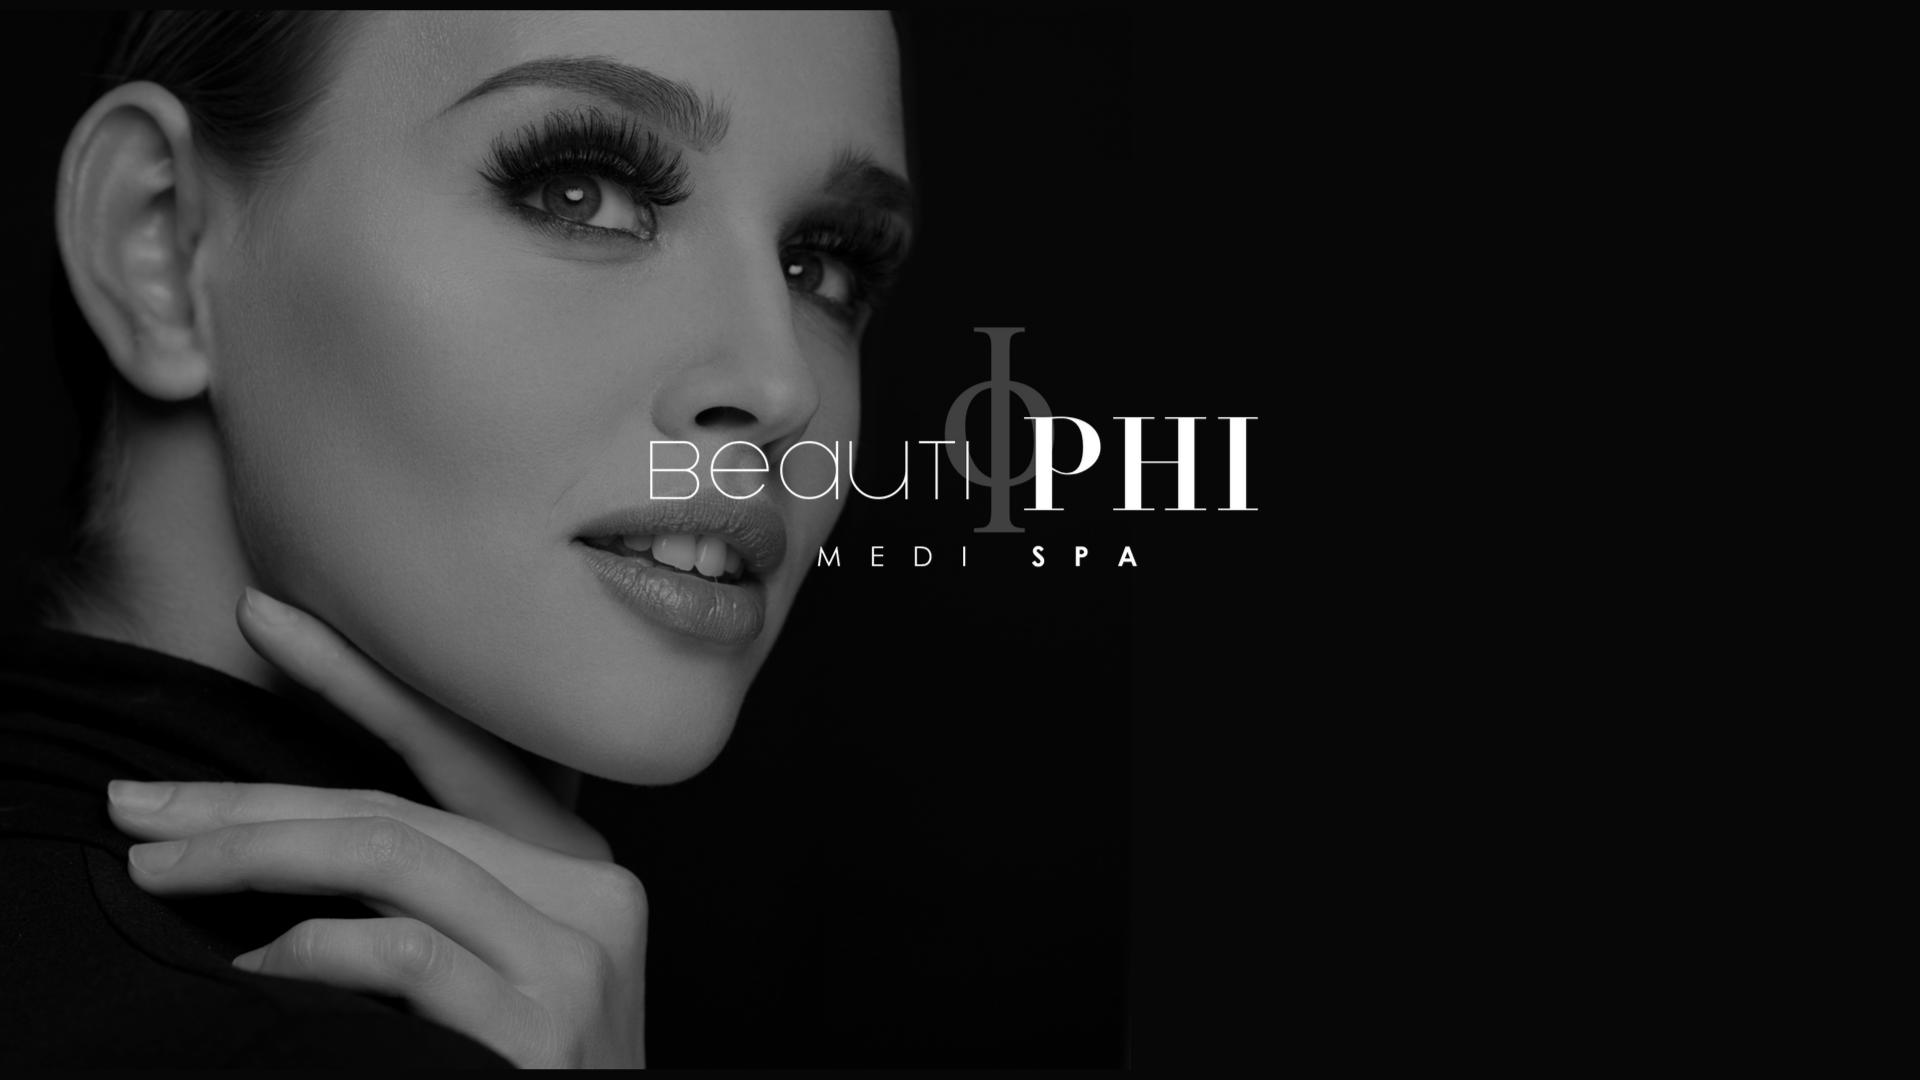 BeautiPhi - Luxury Medi Spa